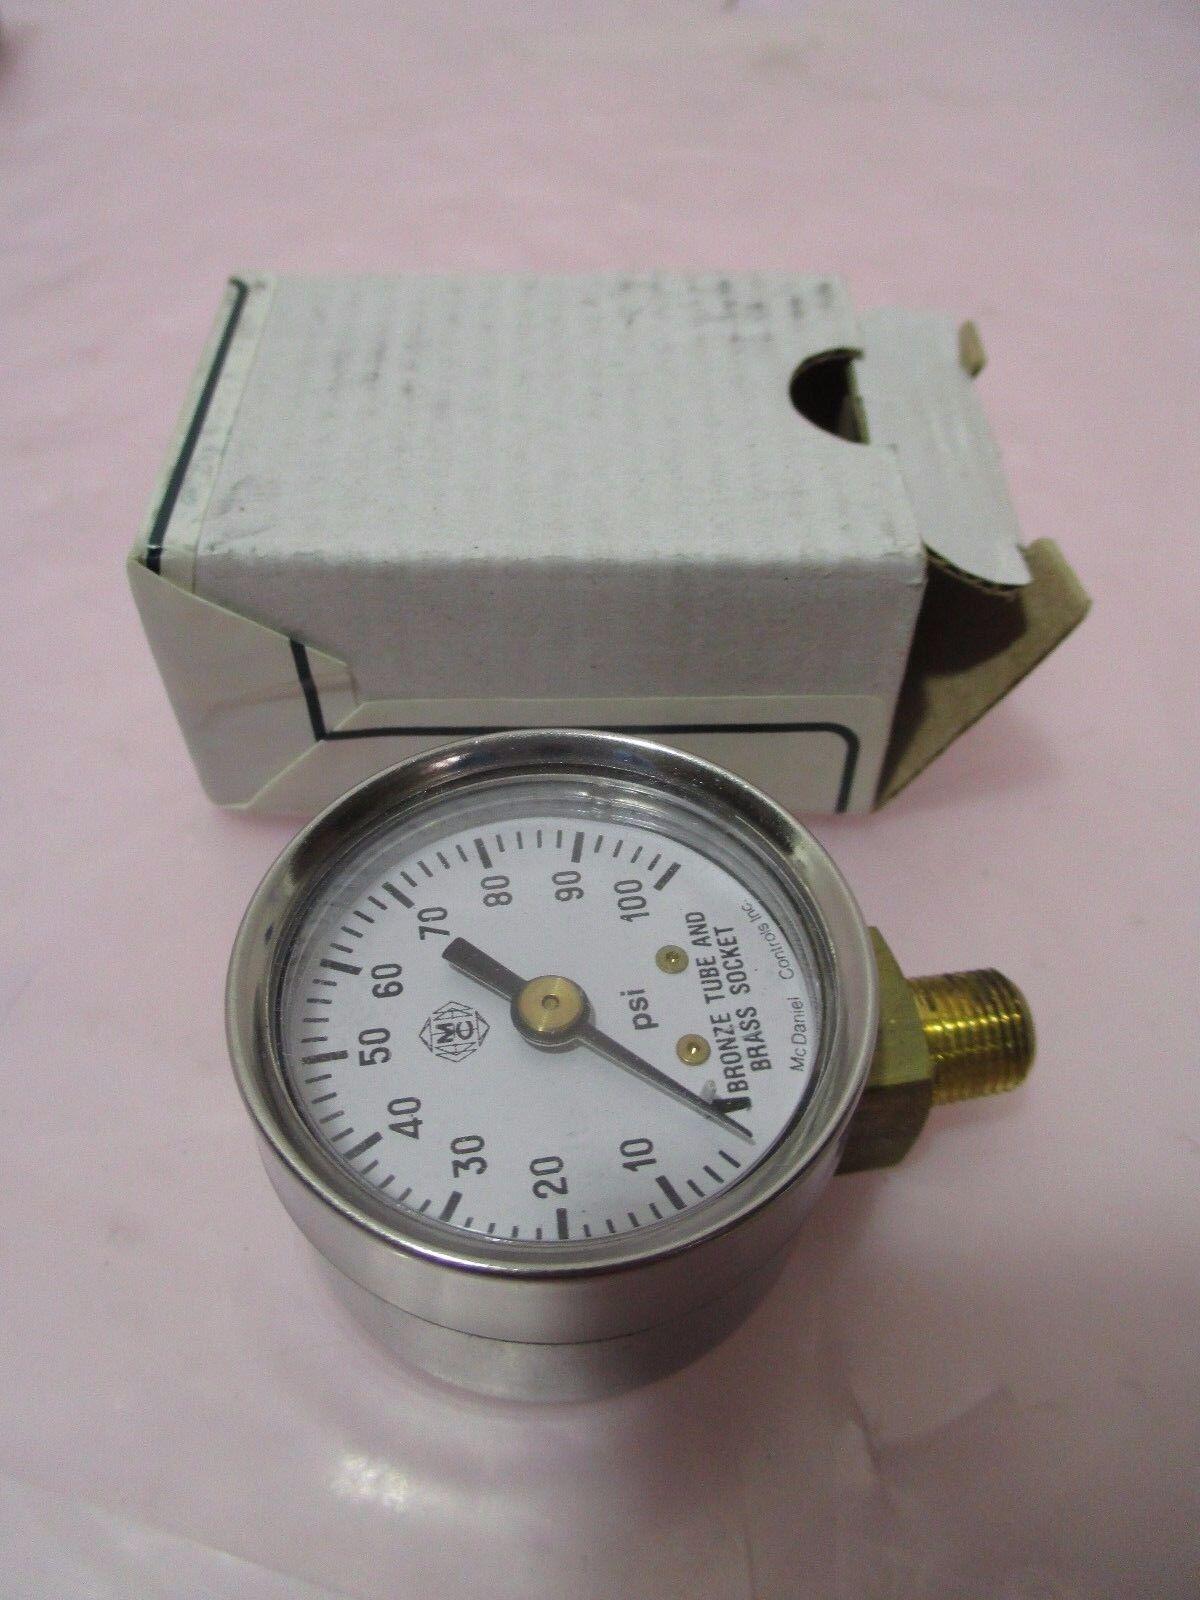 "AMAT 3310-01259 Gauge Press 1.5"" DIA 0-100PSI 1/8NPT BO, 421036"